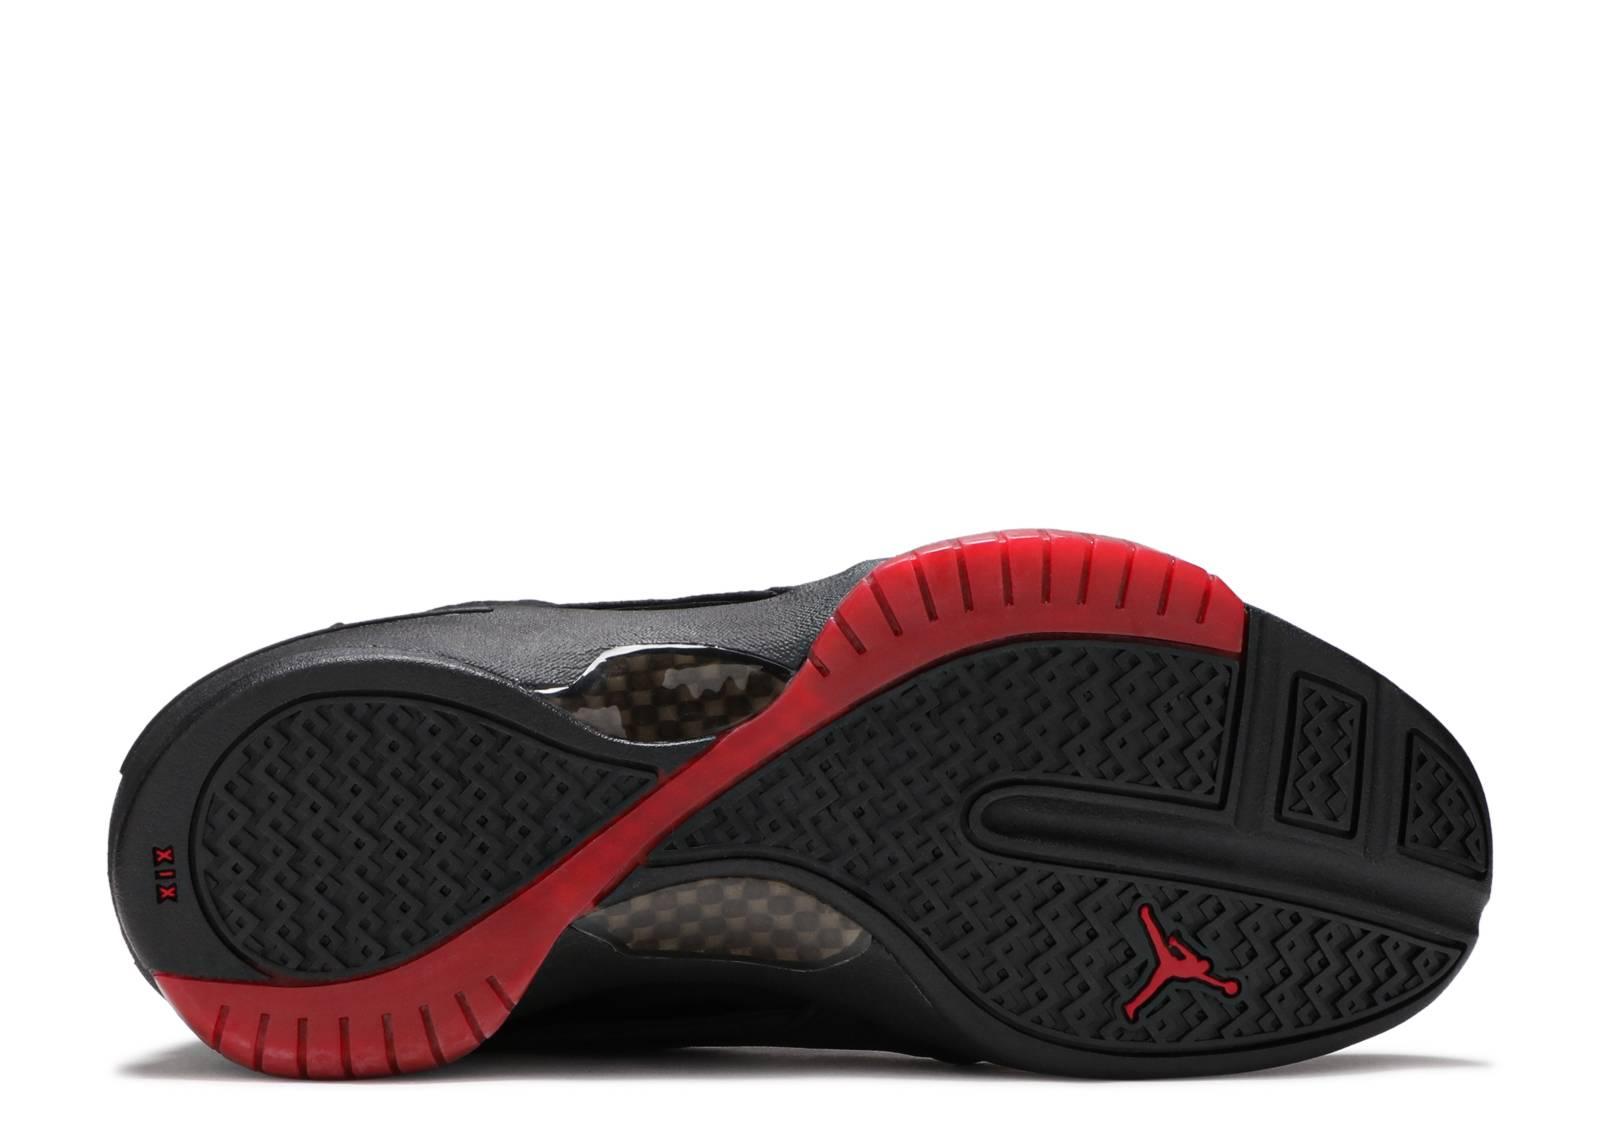 f25409c85e8 Air Jordan 19 Retro